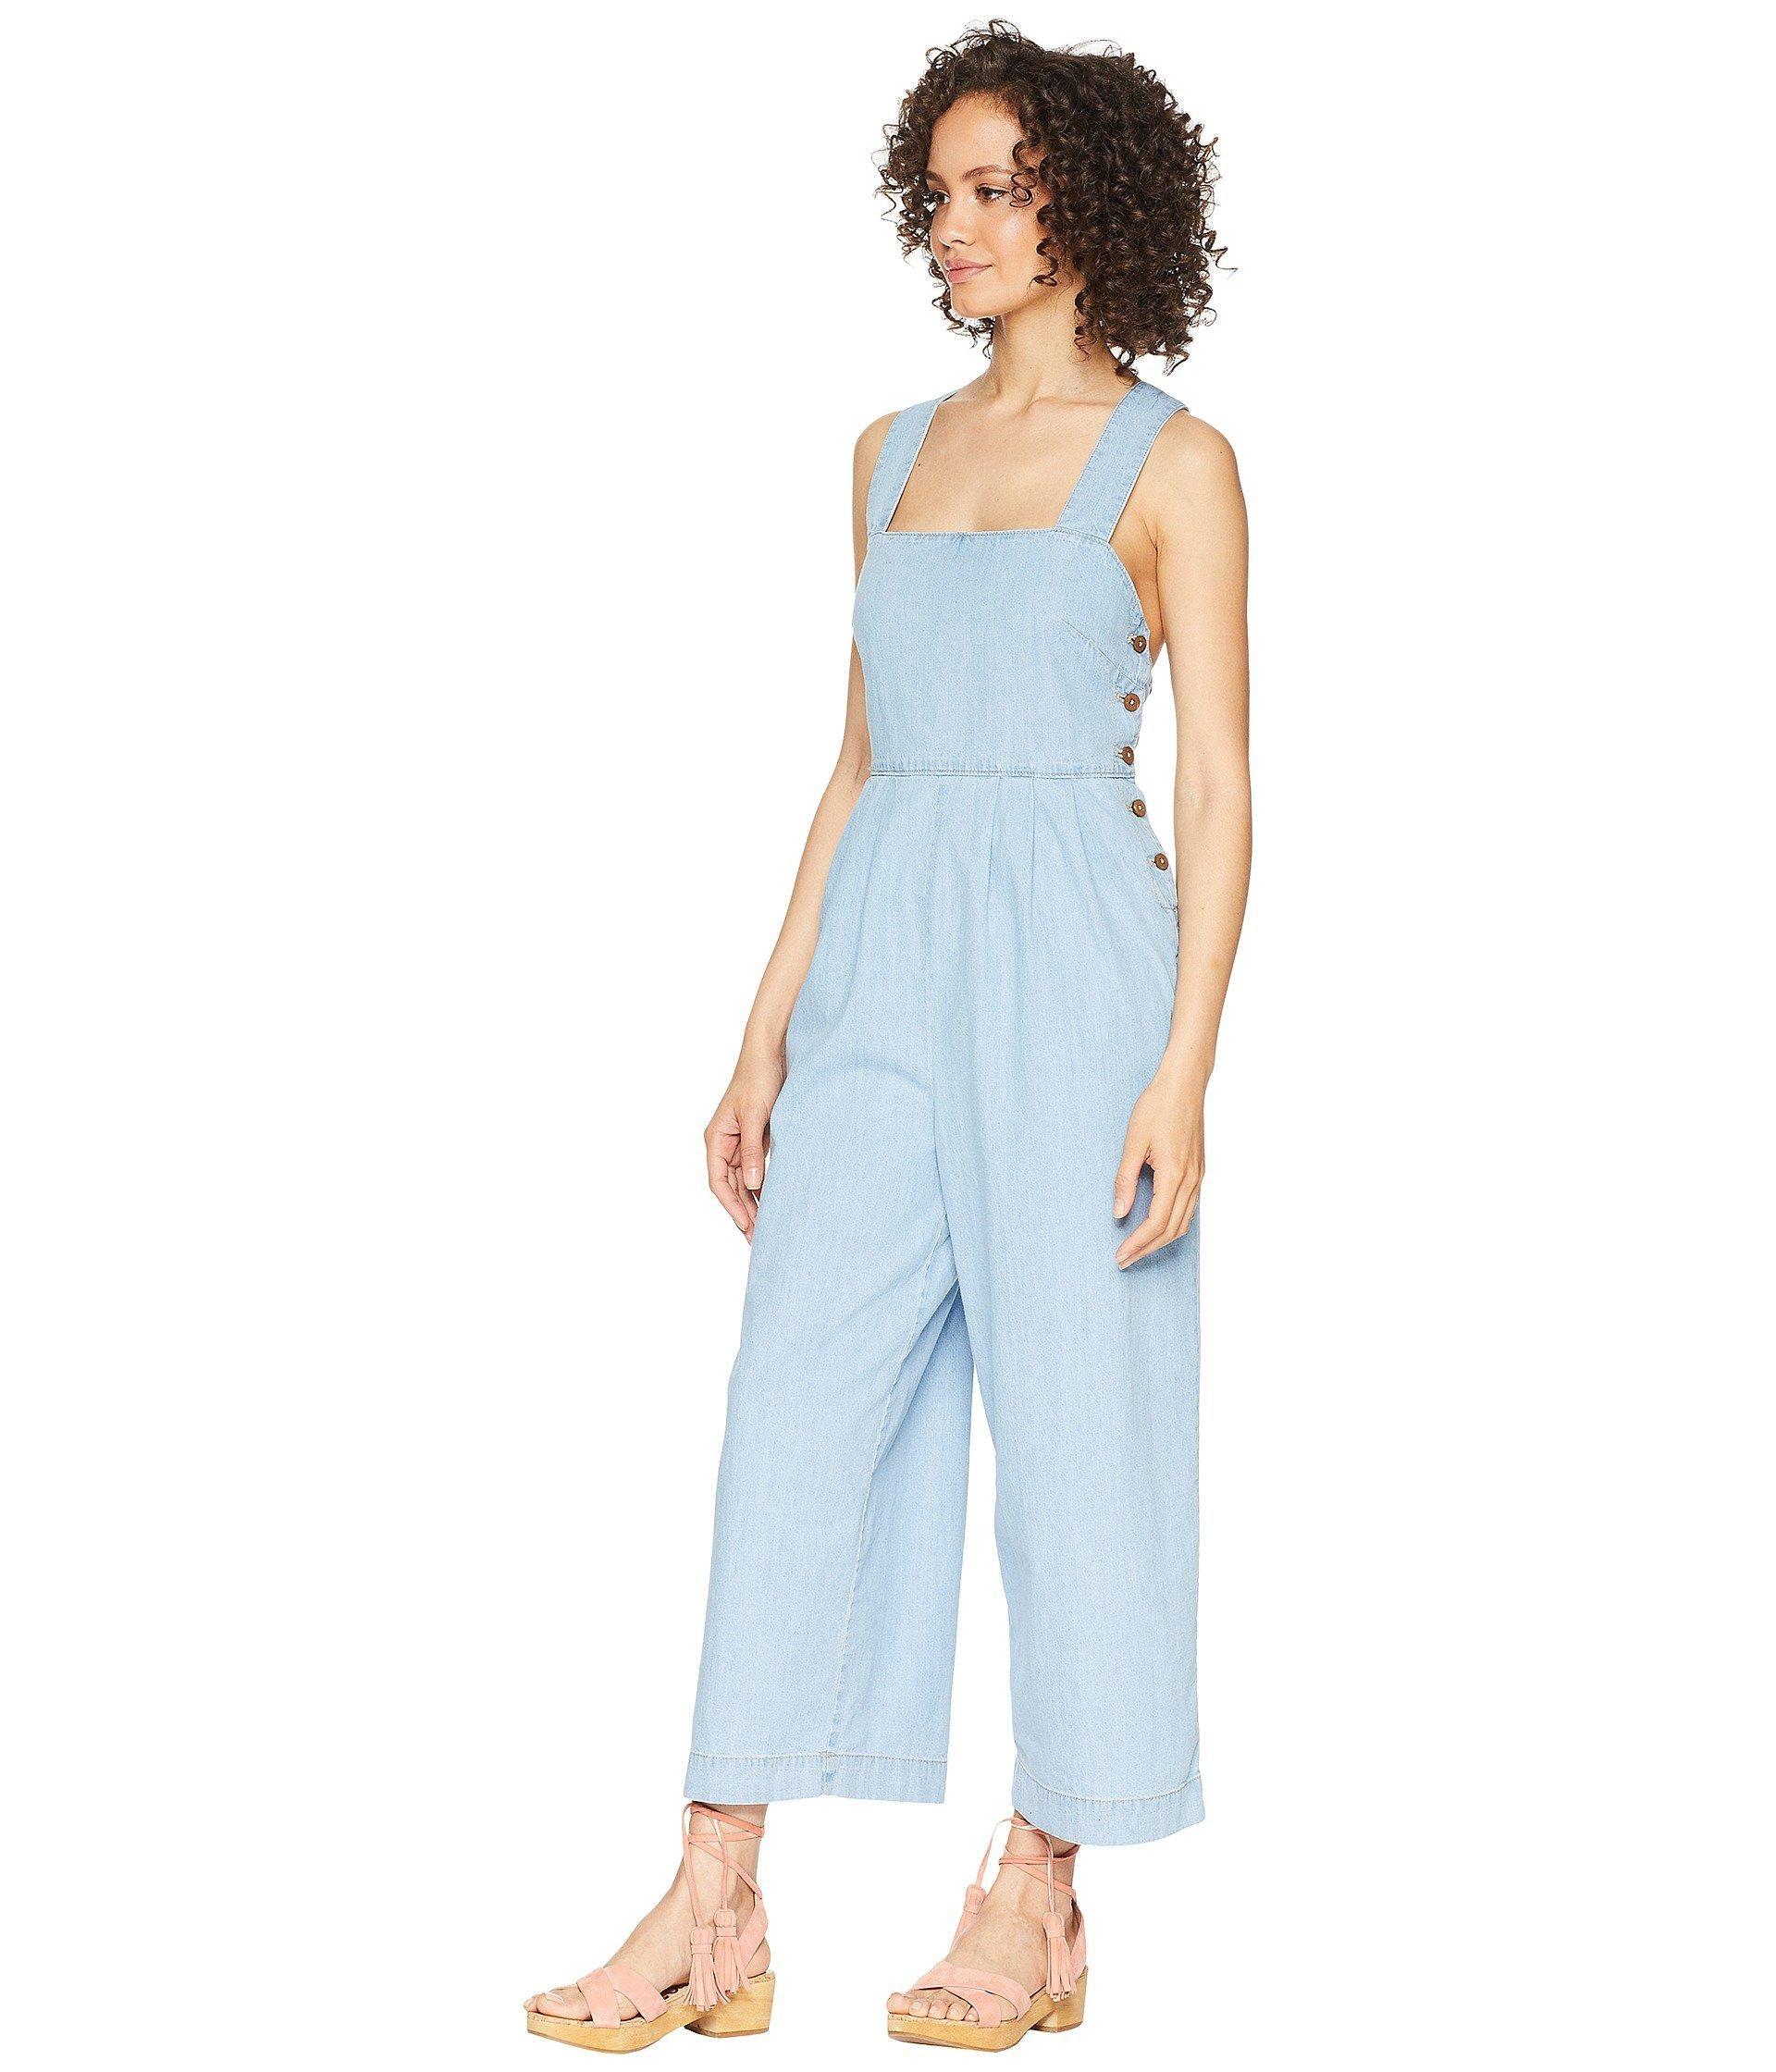 2c228808aa5 Lyst - Free People Fara Jumpsuit - Indigo in Blue - Save 37%